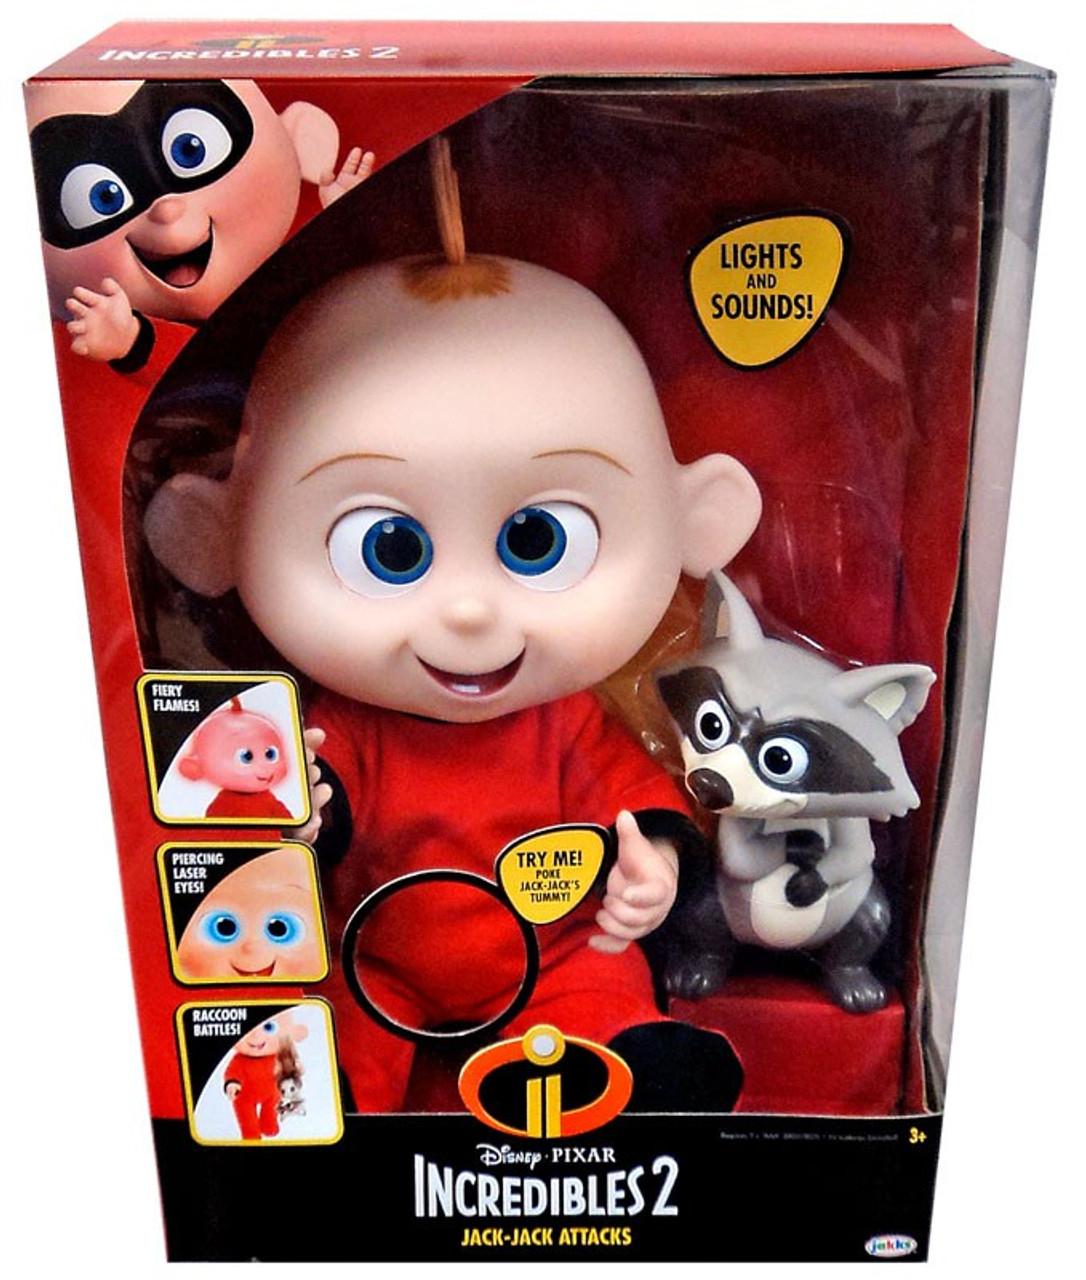 Disney Pixar Incredibles 2 Jack-Jack Attacks Doll Lights Sounds Jakks Pacific - ToyWiz  sc 1 st  ToyWiz.com & Disney Pixar Incredibles 2 Jack-Jack Attacks Doll Lights Sounds ...